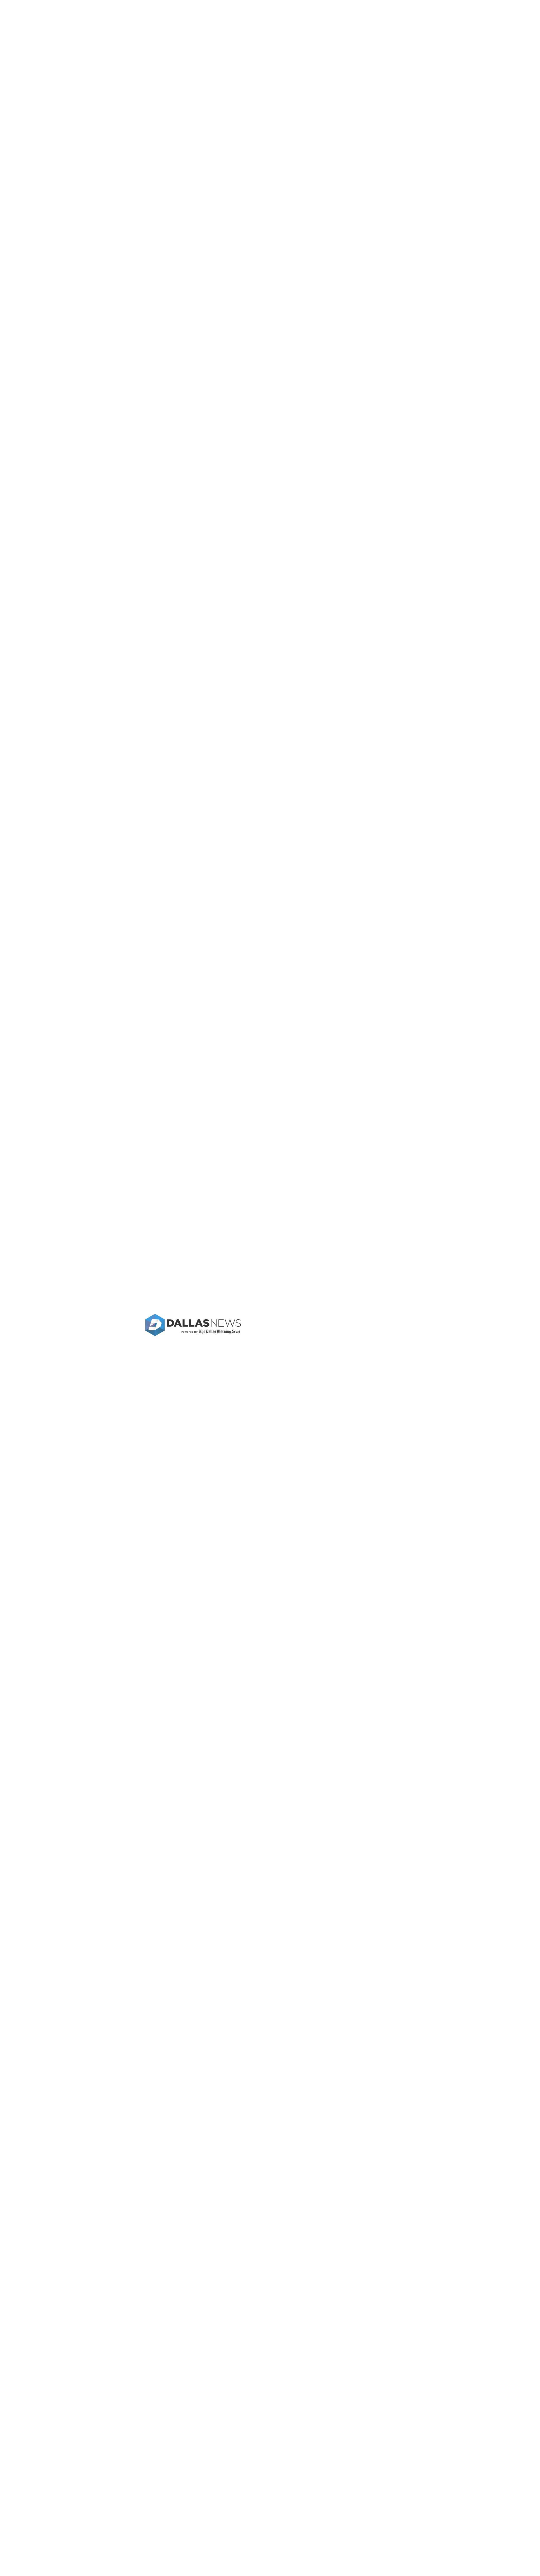 dallasnews.com at Monday Feb. 5, 2018, 11:03 a.m. UTC